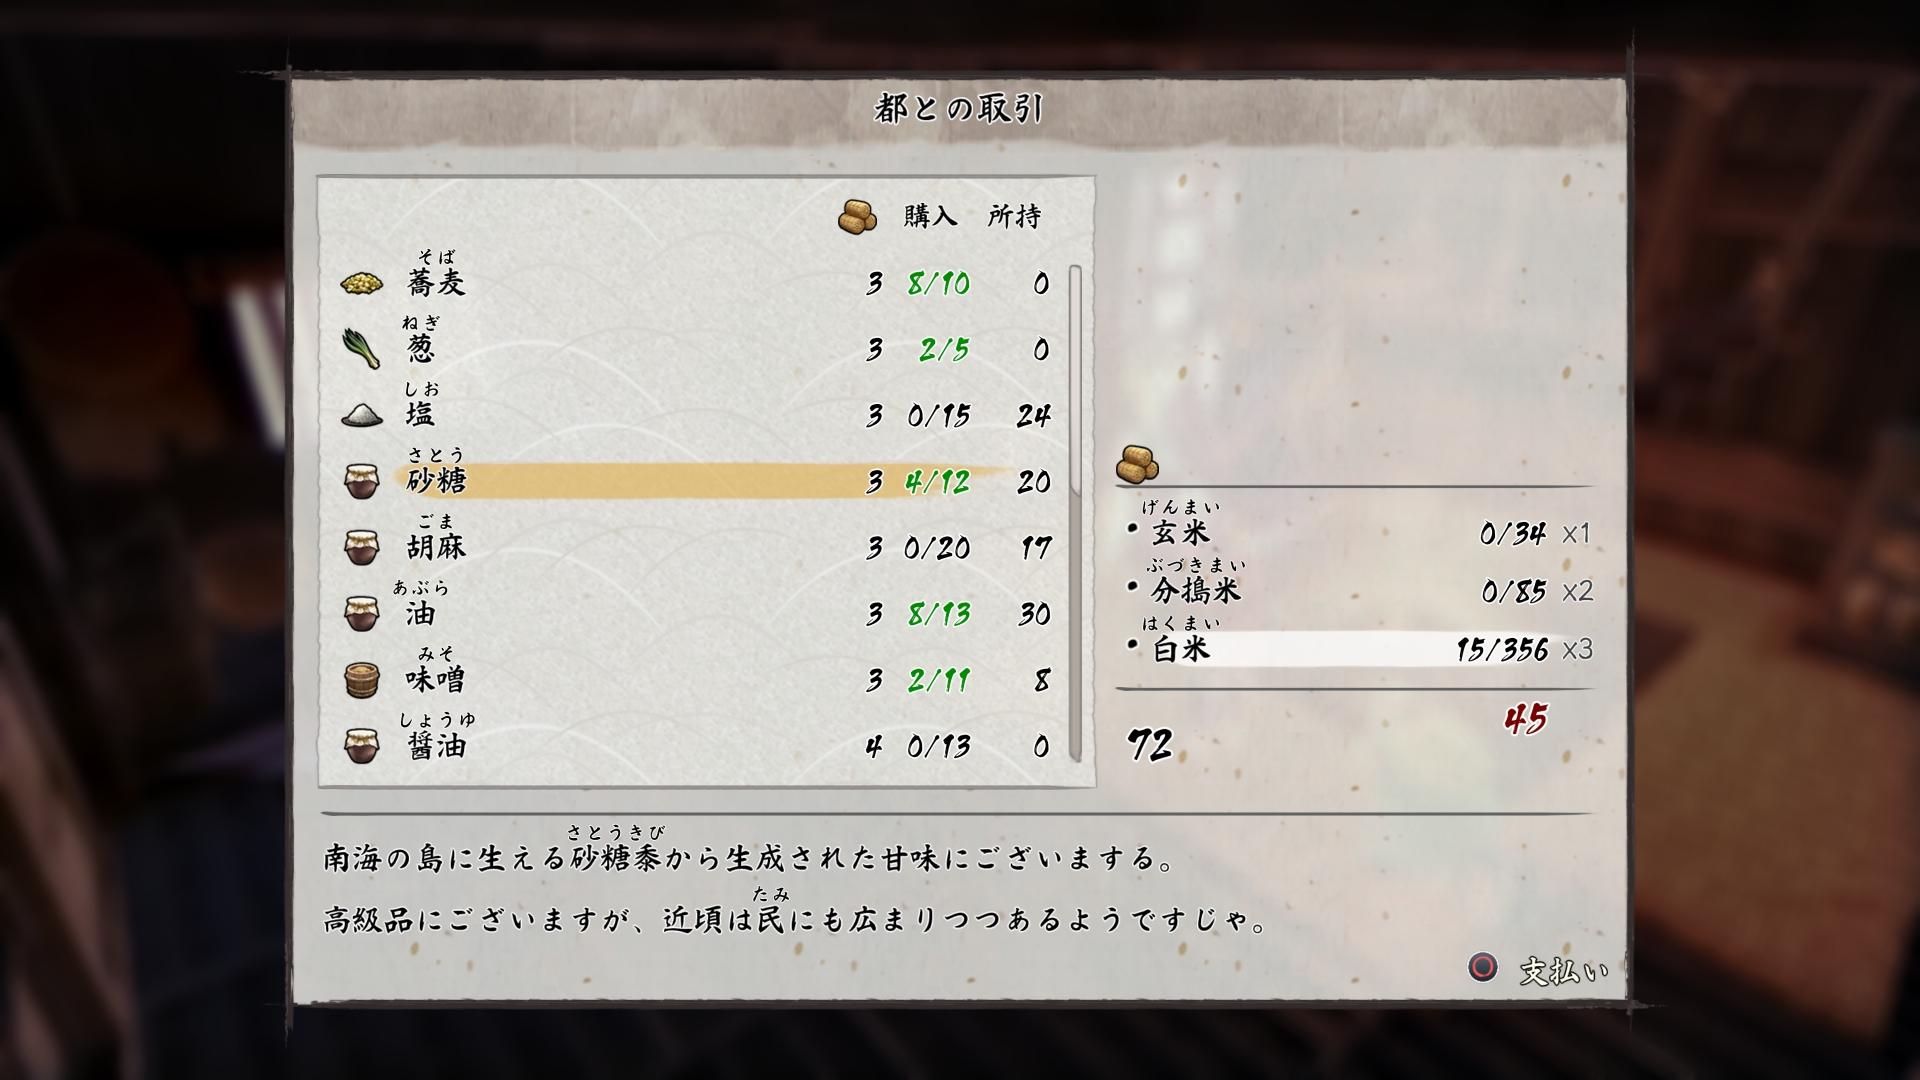 DMC v Shin Megami Tensei III a tutoriál ke Captainu Tsubasovi Sakuna Of Rice and Ruin 2020 08 11 20 020